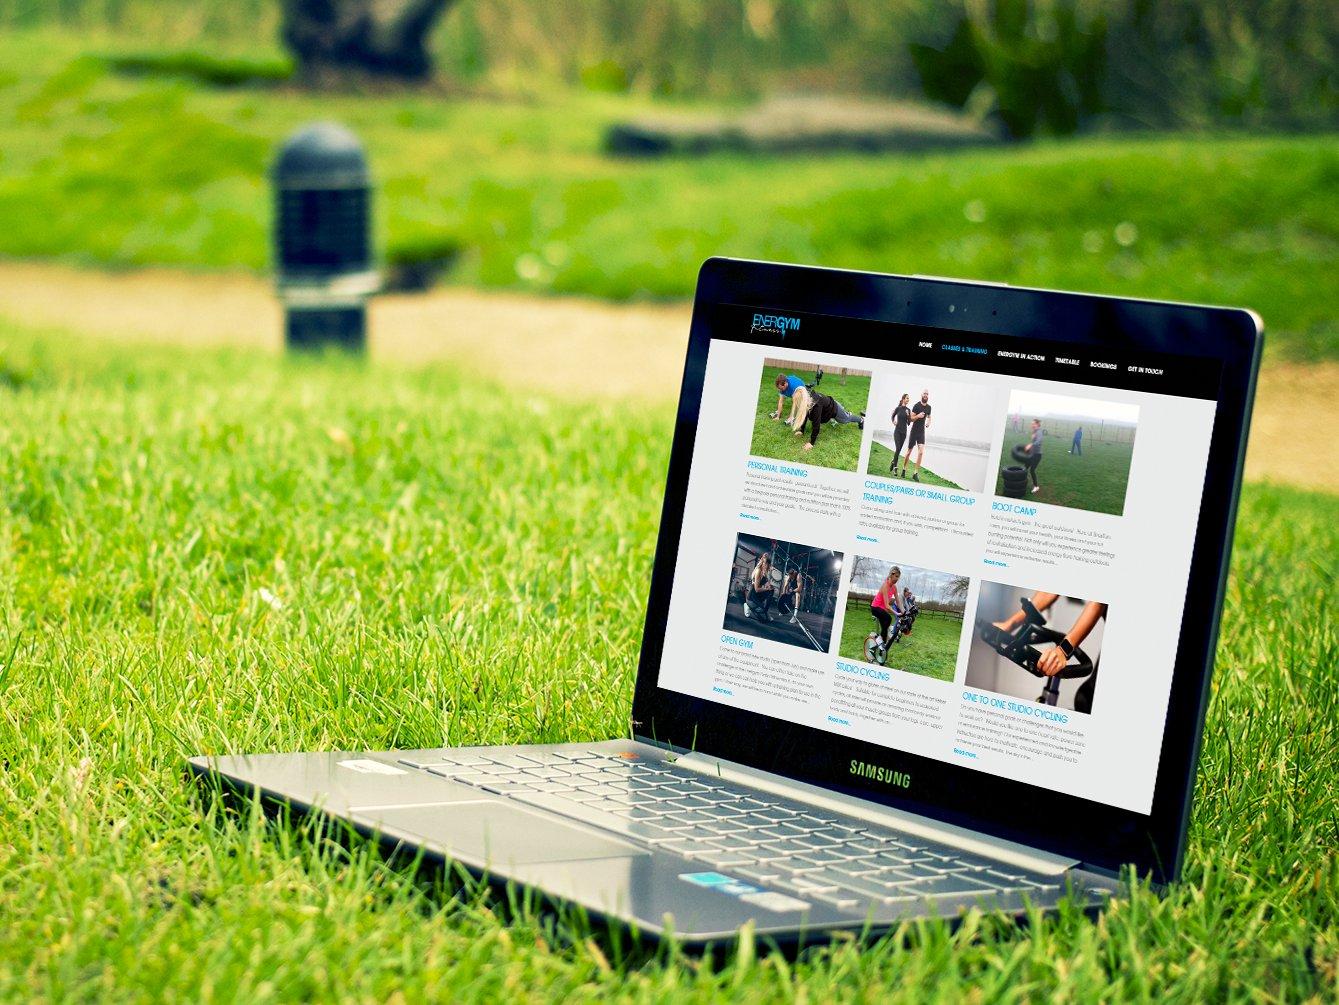 Laptop in park.jpg